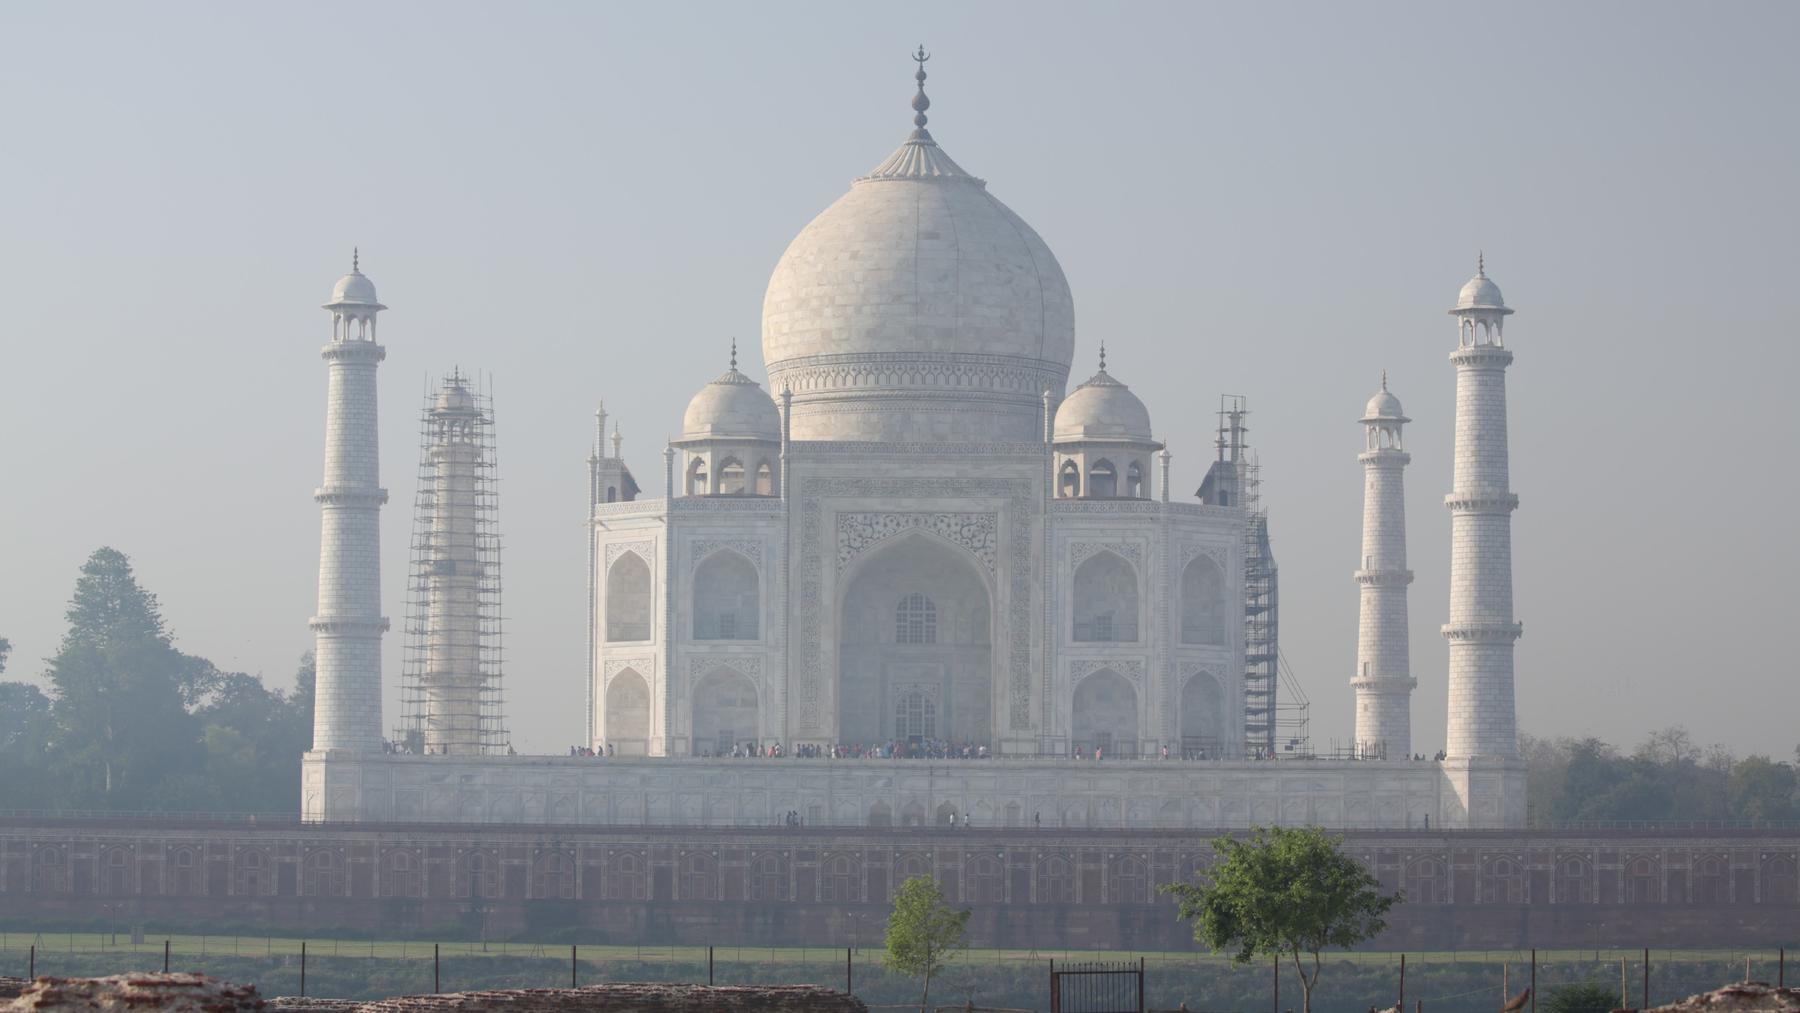 Giganten der Geschichte - Taj Mahal